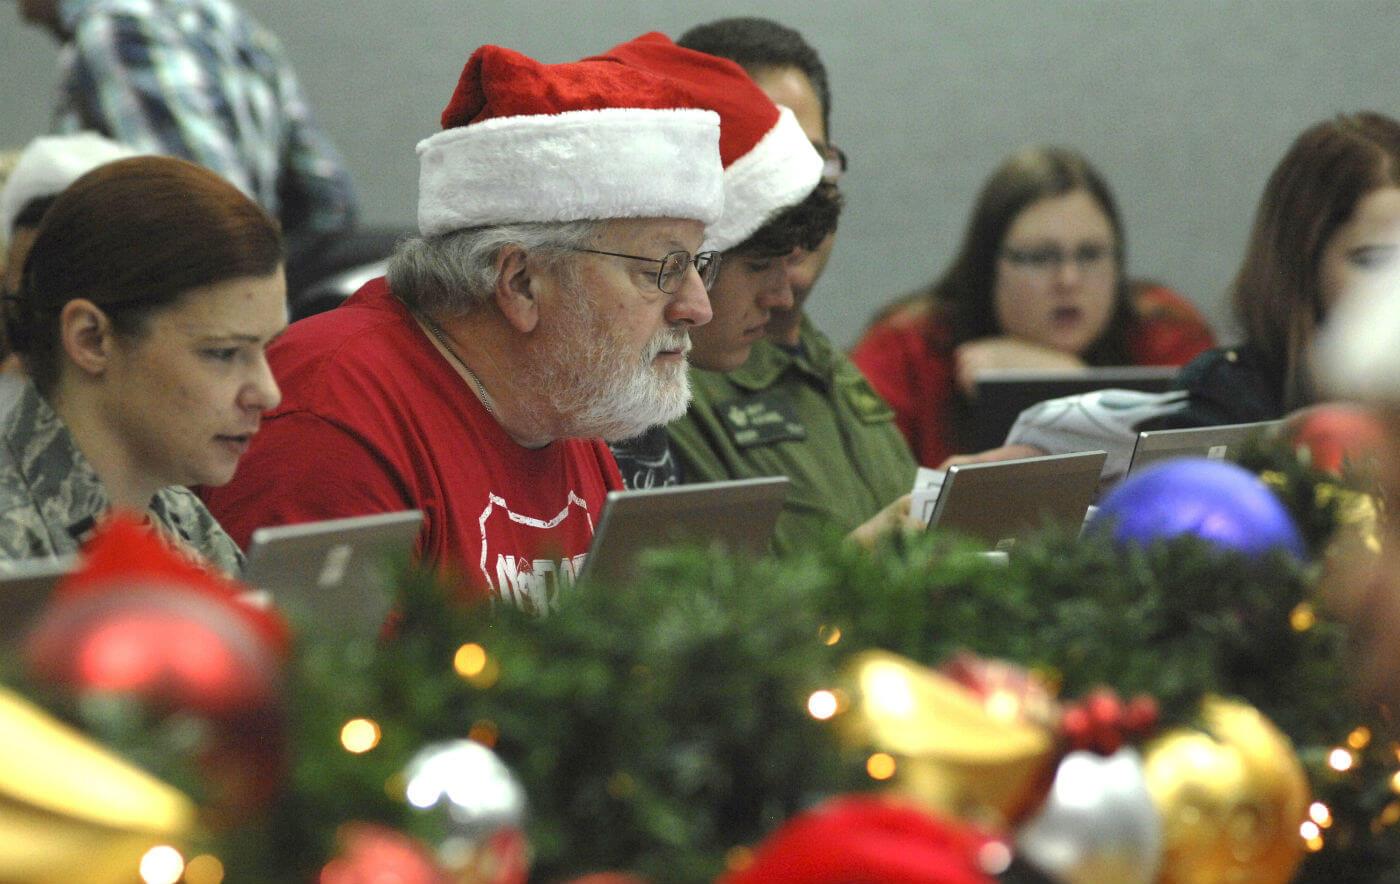 NORAD keeping tabs on Santa this Christmas Eve - Skies Mag